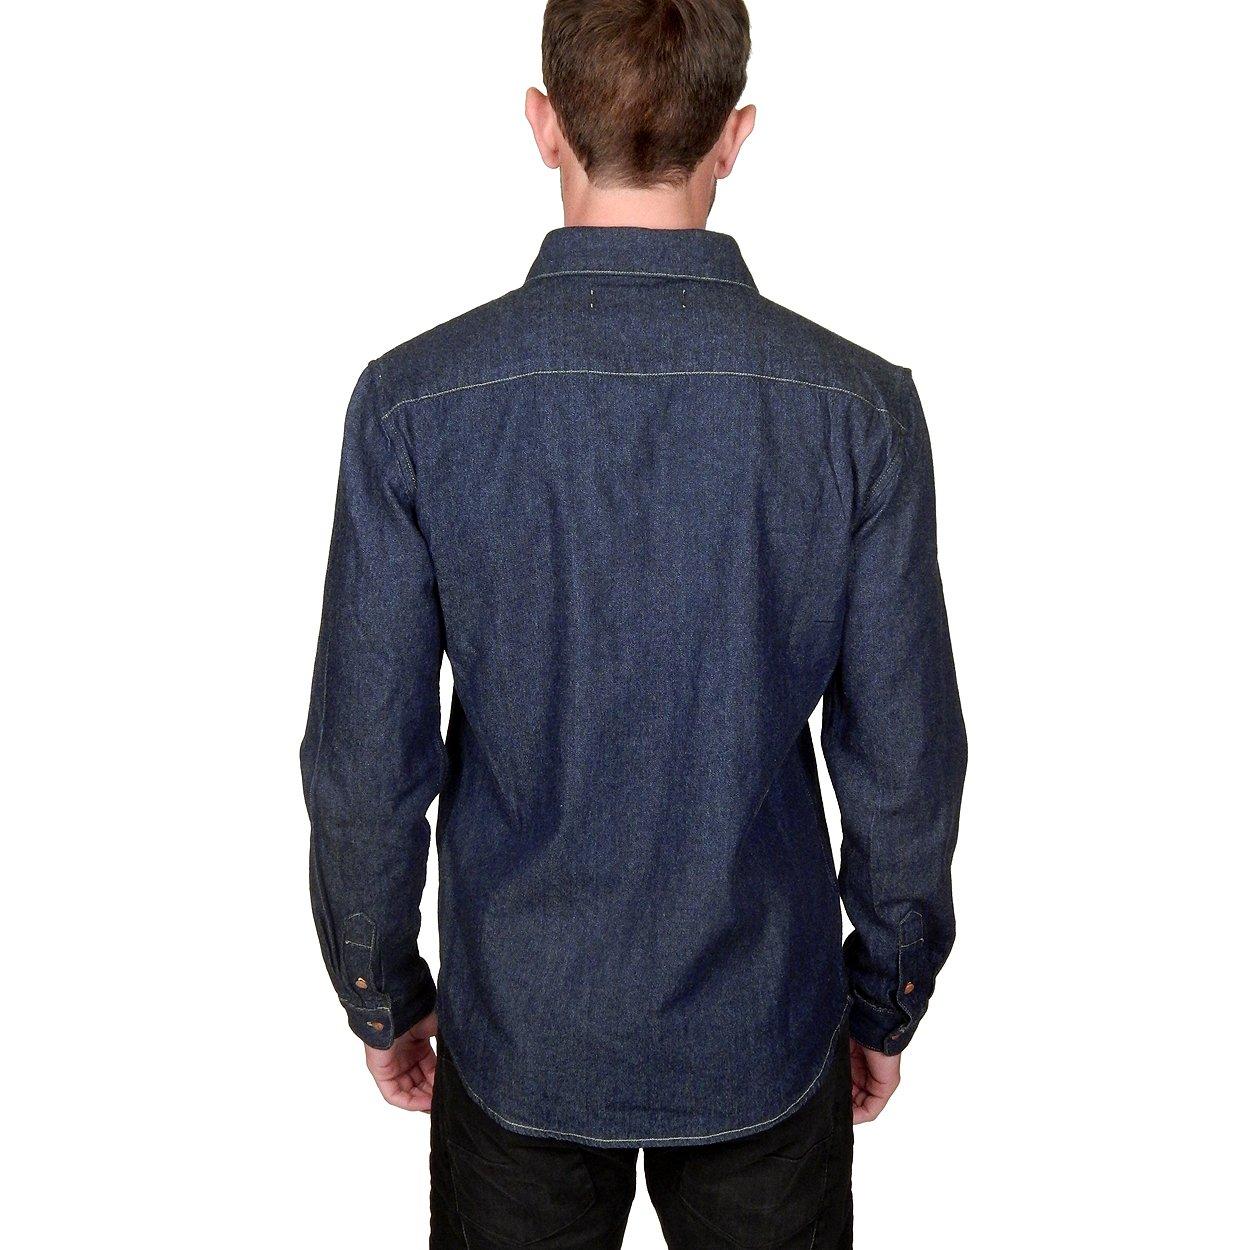 4961048fd12 Prospective Flow Men s Lyon Denim Shirt in Indigo at Amazon Men s Clothing  store